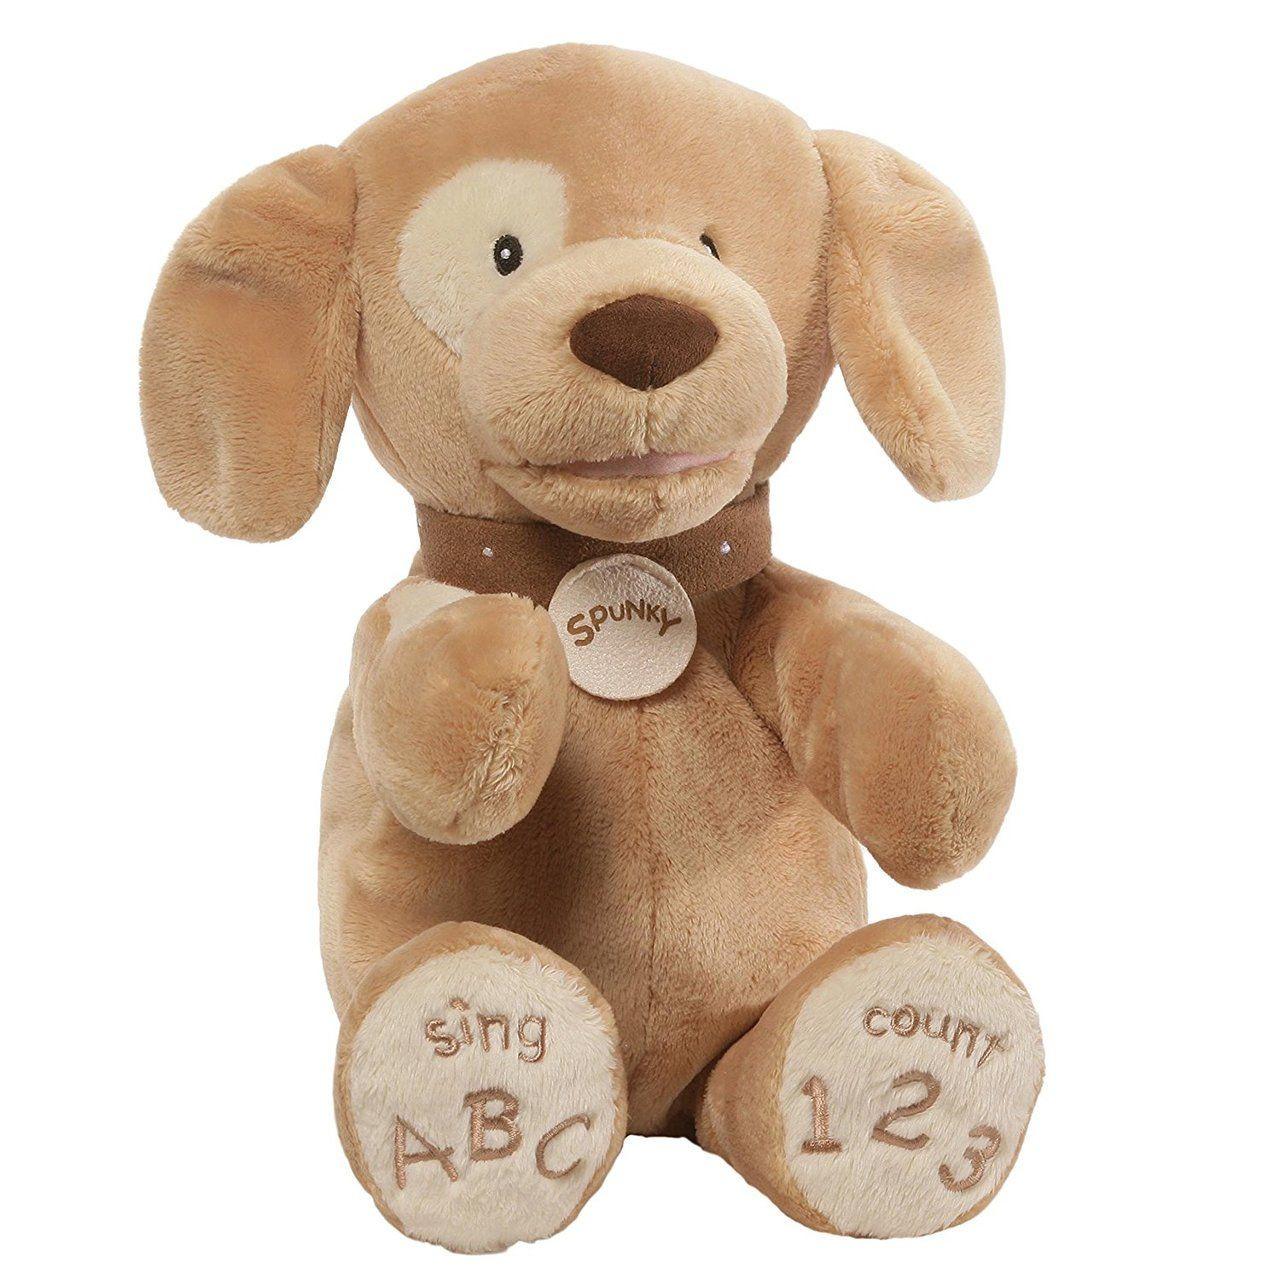 GUND Baby Spunky ABC 123 Stuffed Animated Plush Dog cf1f6691a